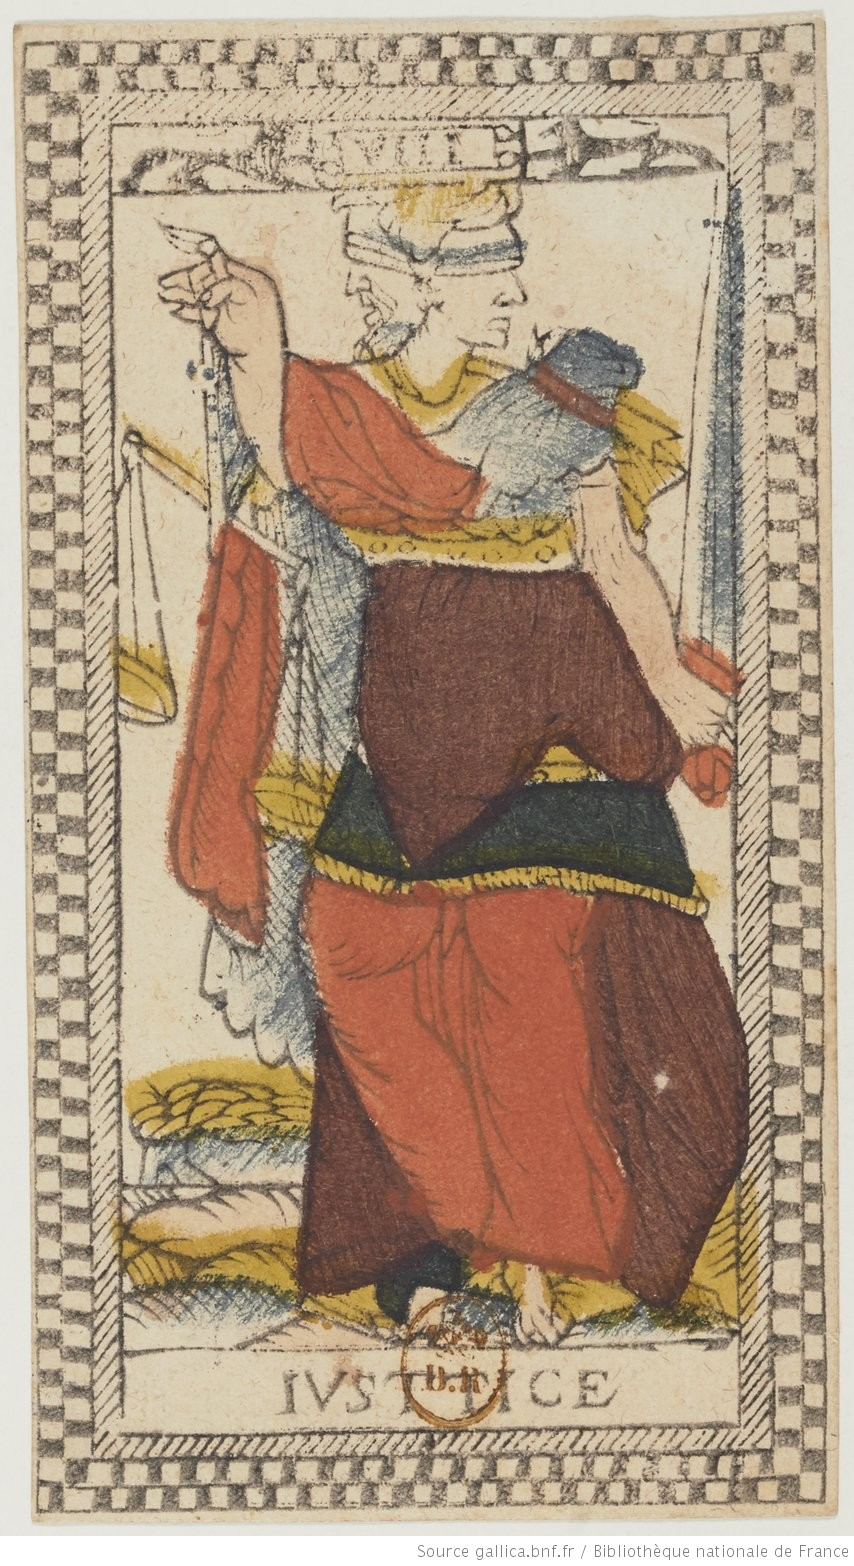 http://gallica.bnf.fr/ark:/12148/btv1b105109624/f15.highres